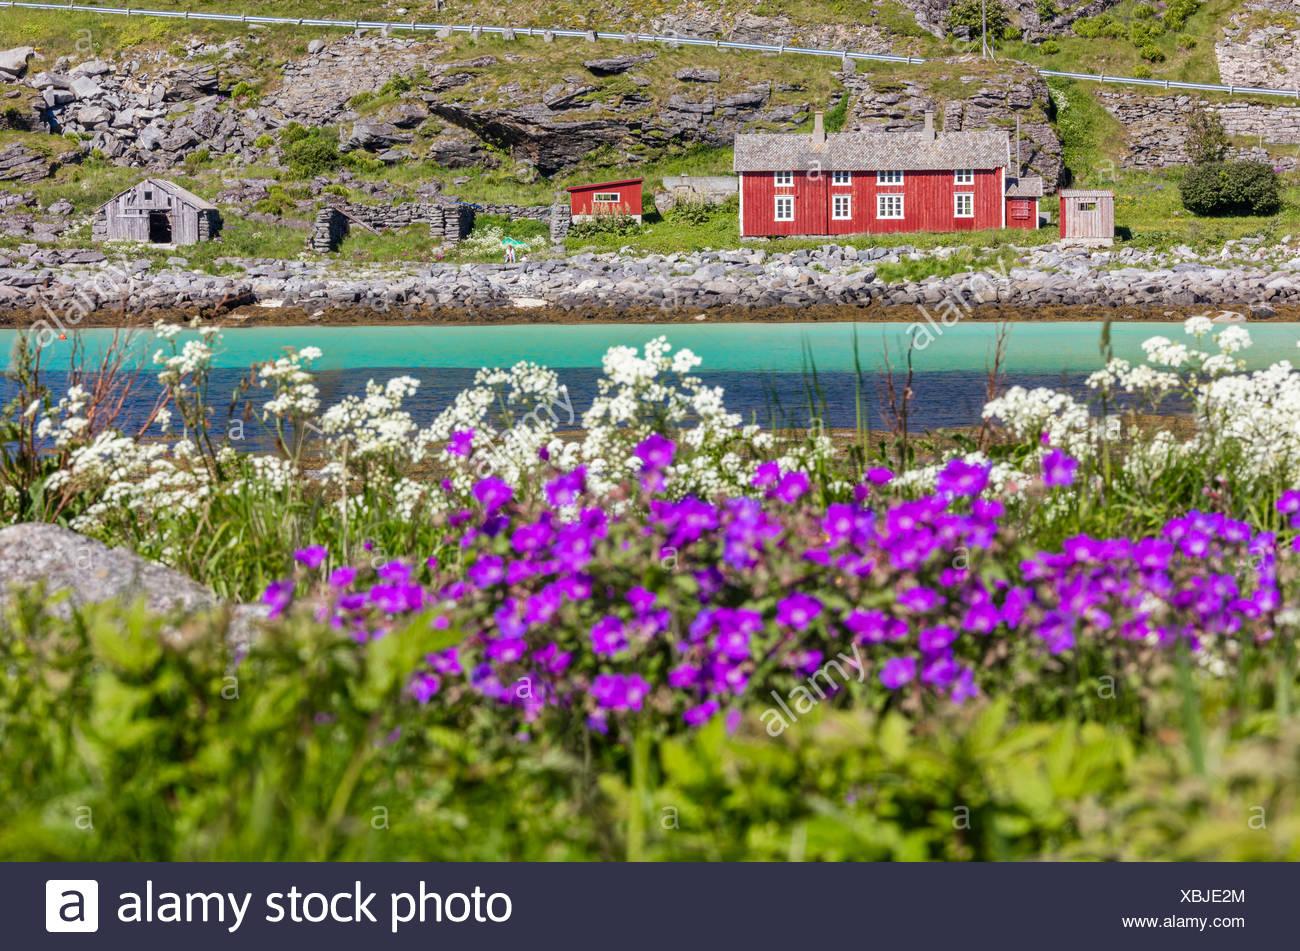 Flowers Of Lofoten Stockfotos & Flowers Of Lofoten Bilder - Alamy